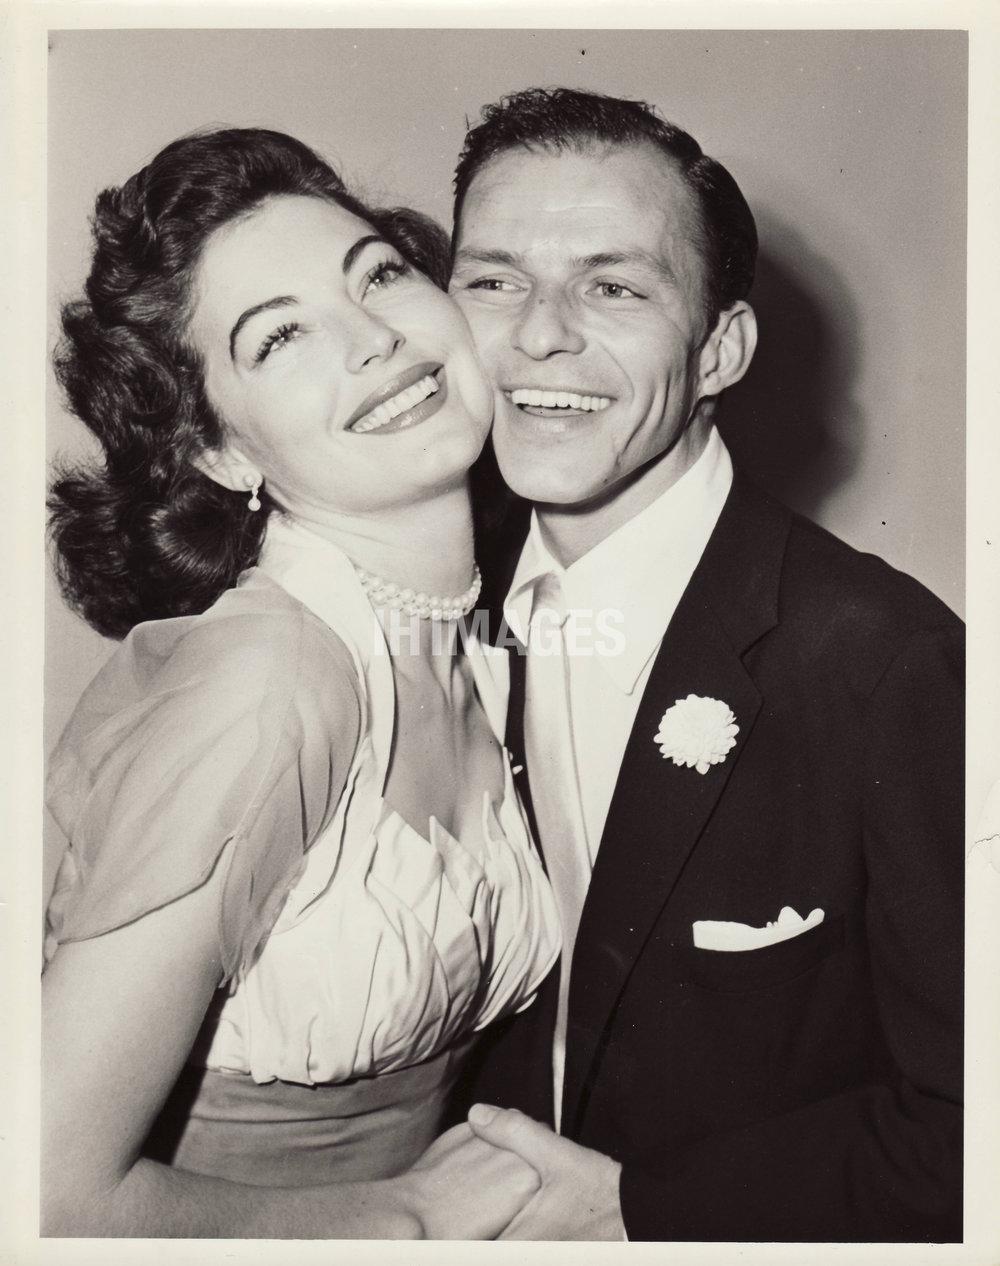 Sinatra-Gardner Wedding - Vintage